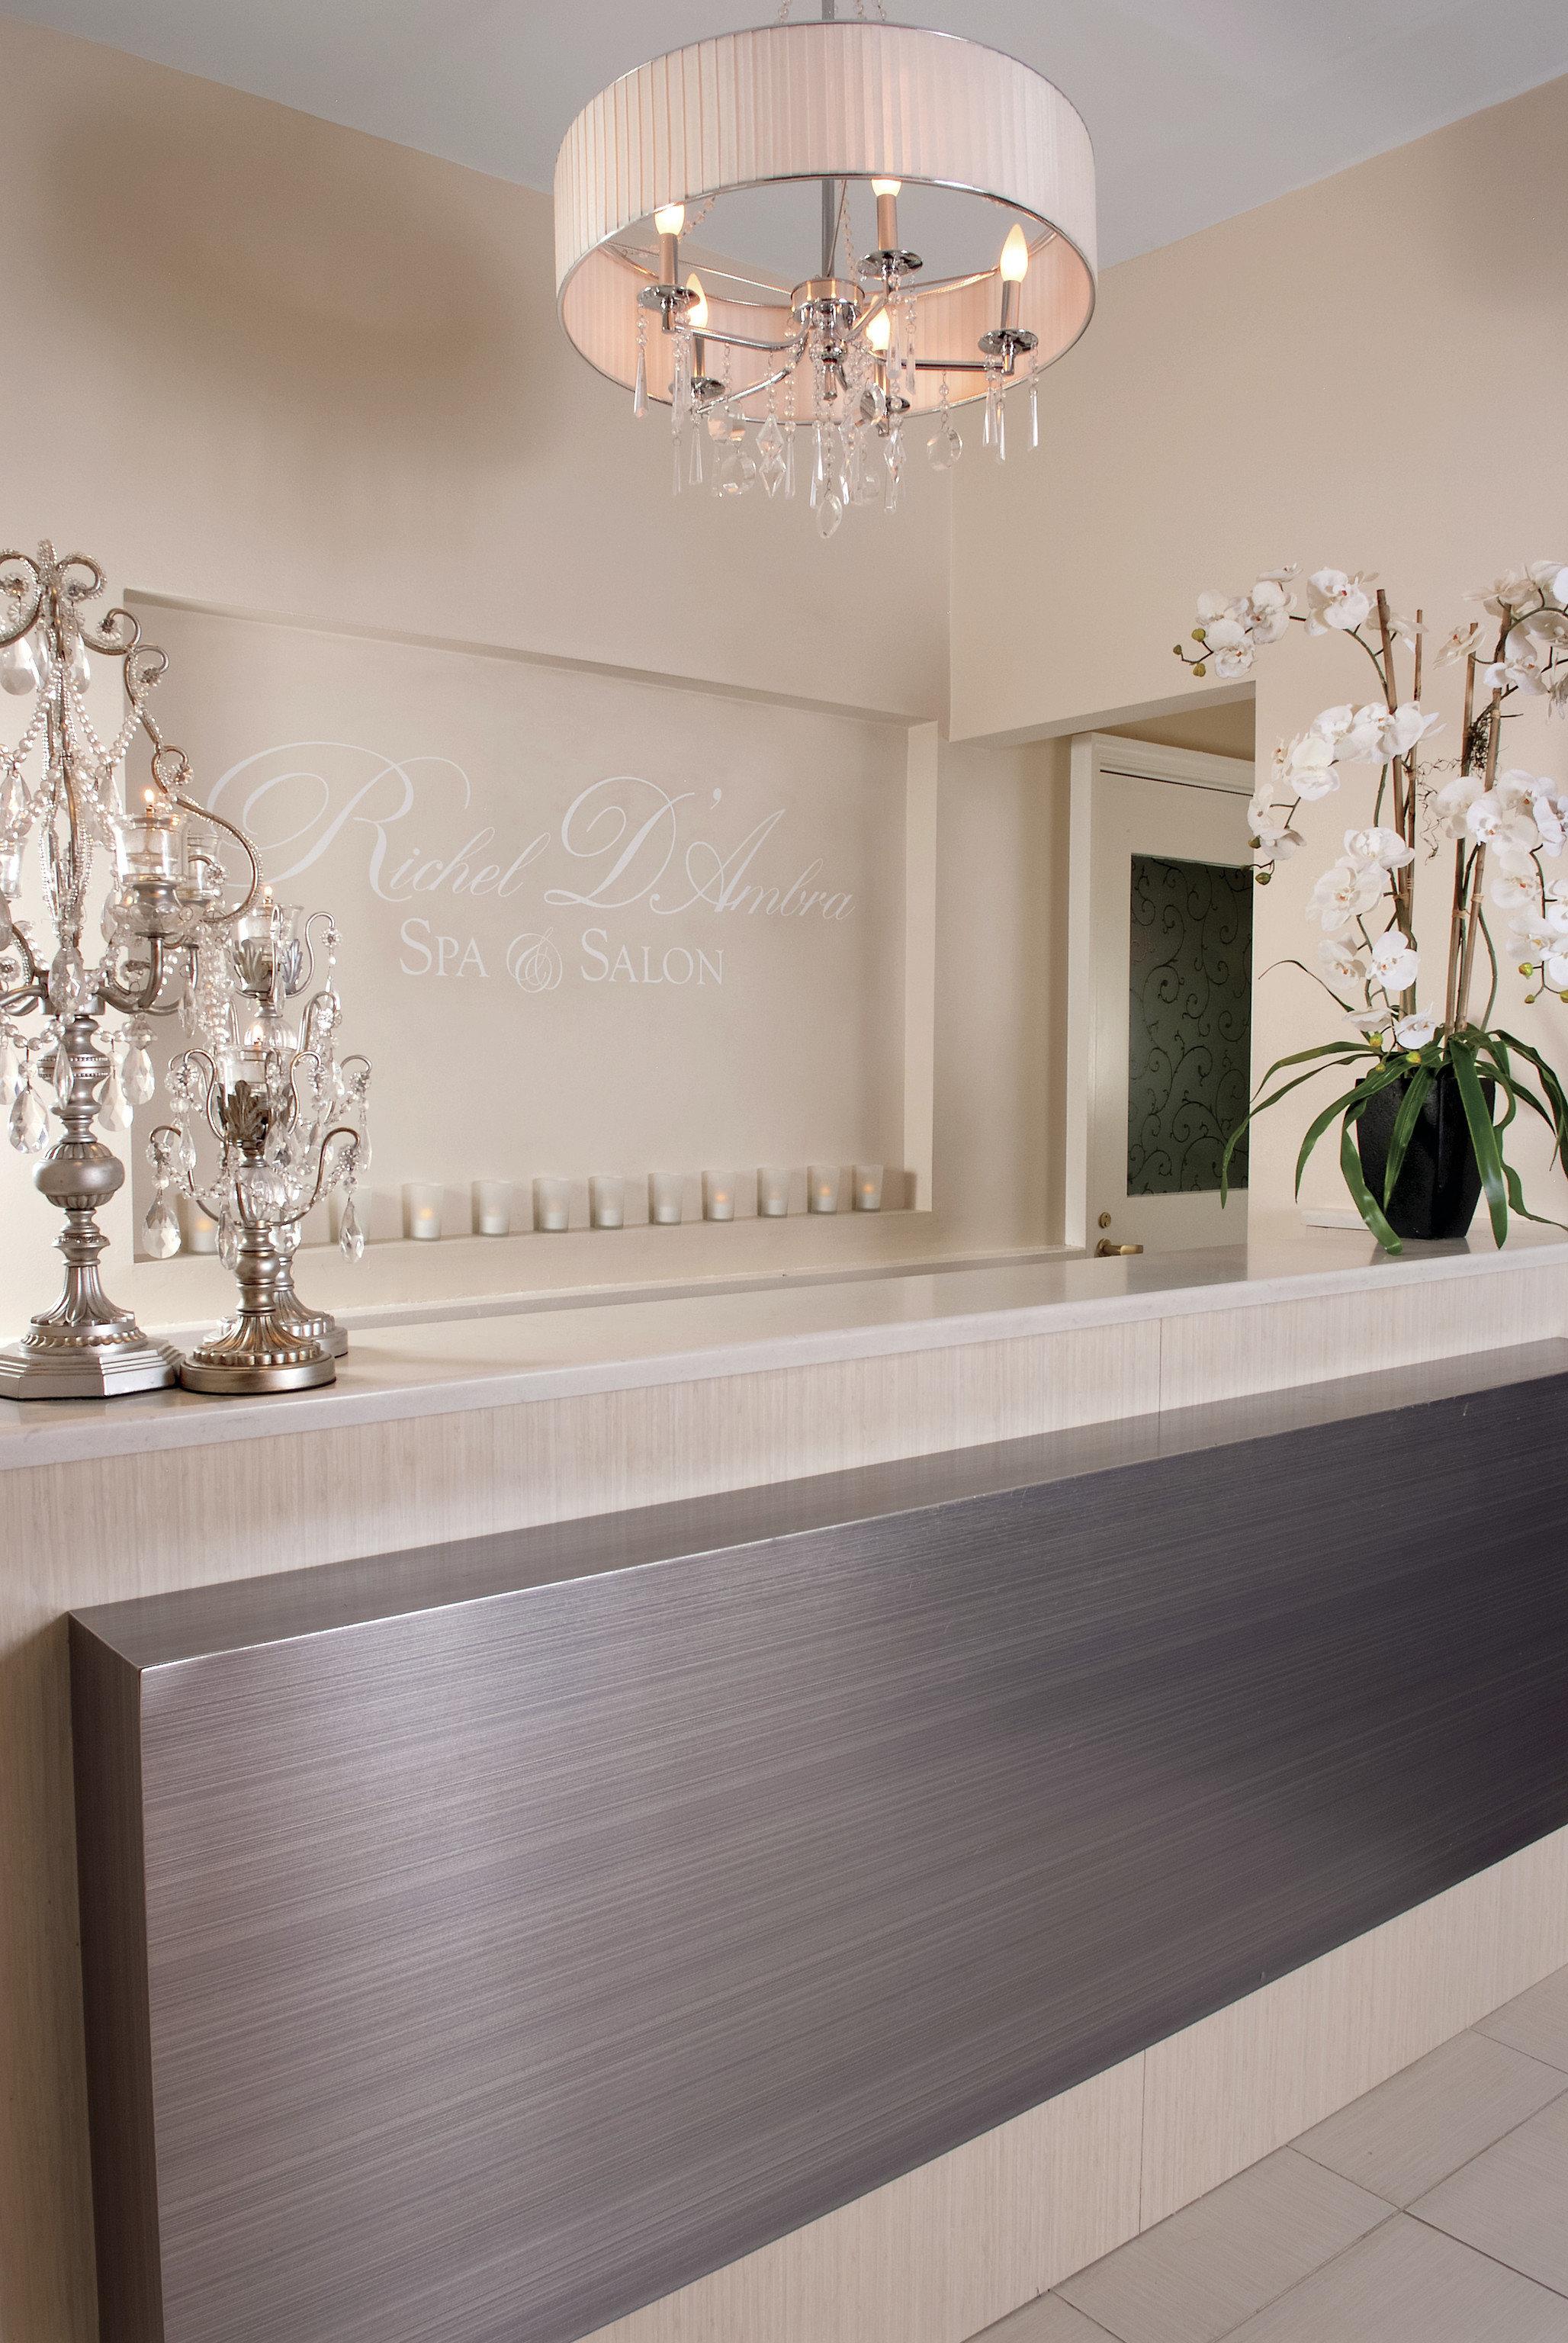 sink tap home bathroom flooring tile angle plant bathroom sink molding light fixture interior designer